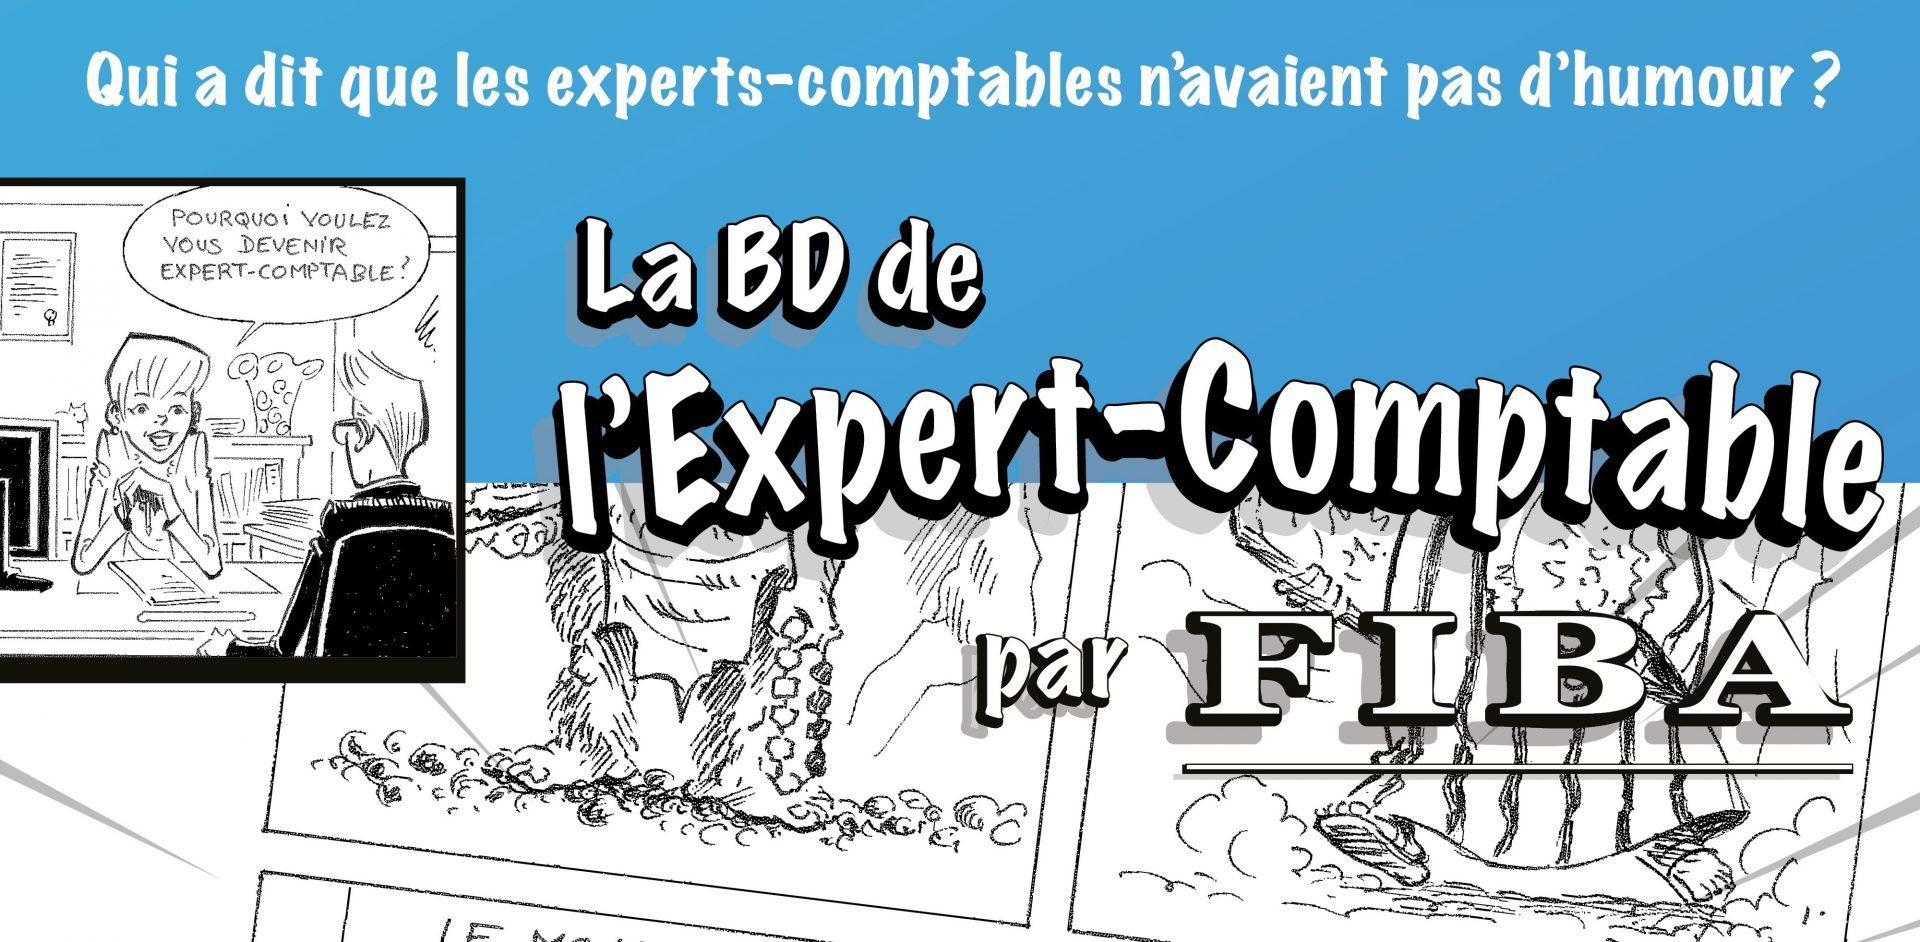 La BD de l'Expert-comptable made by FIBA